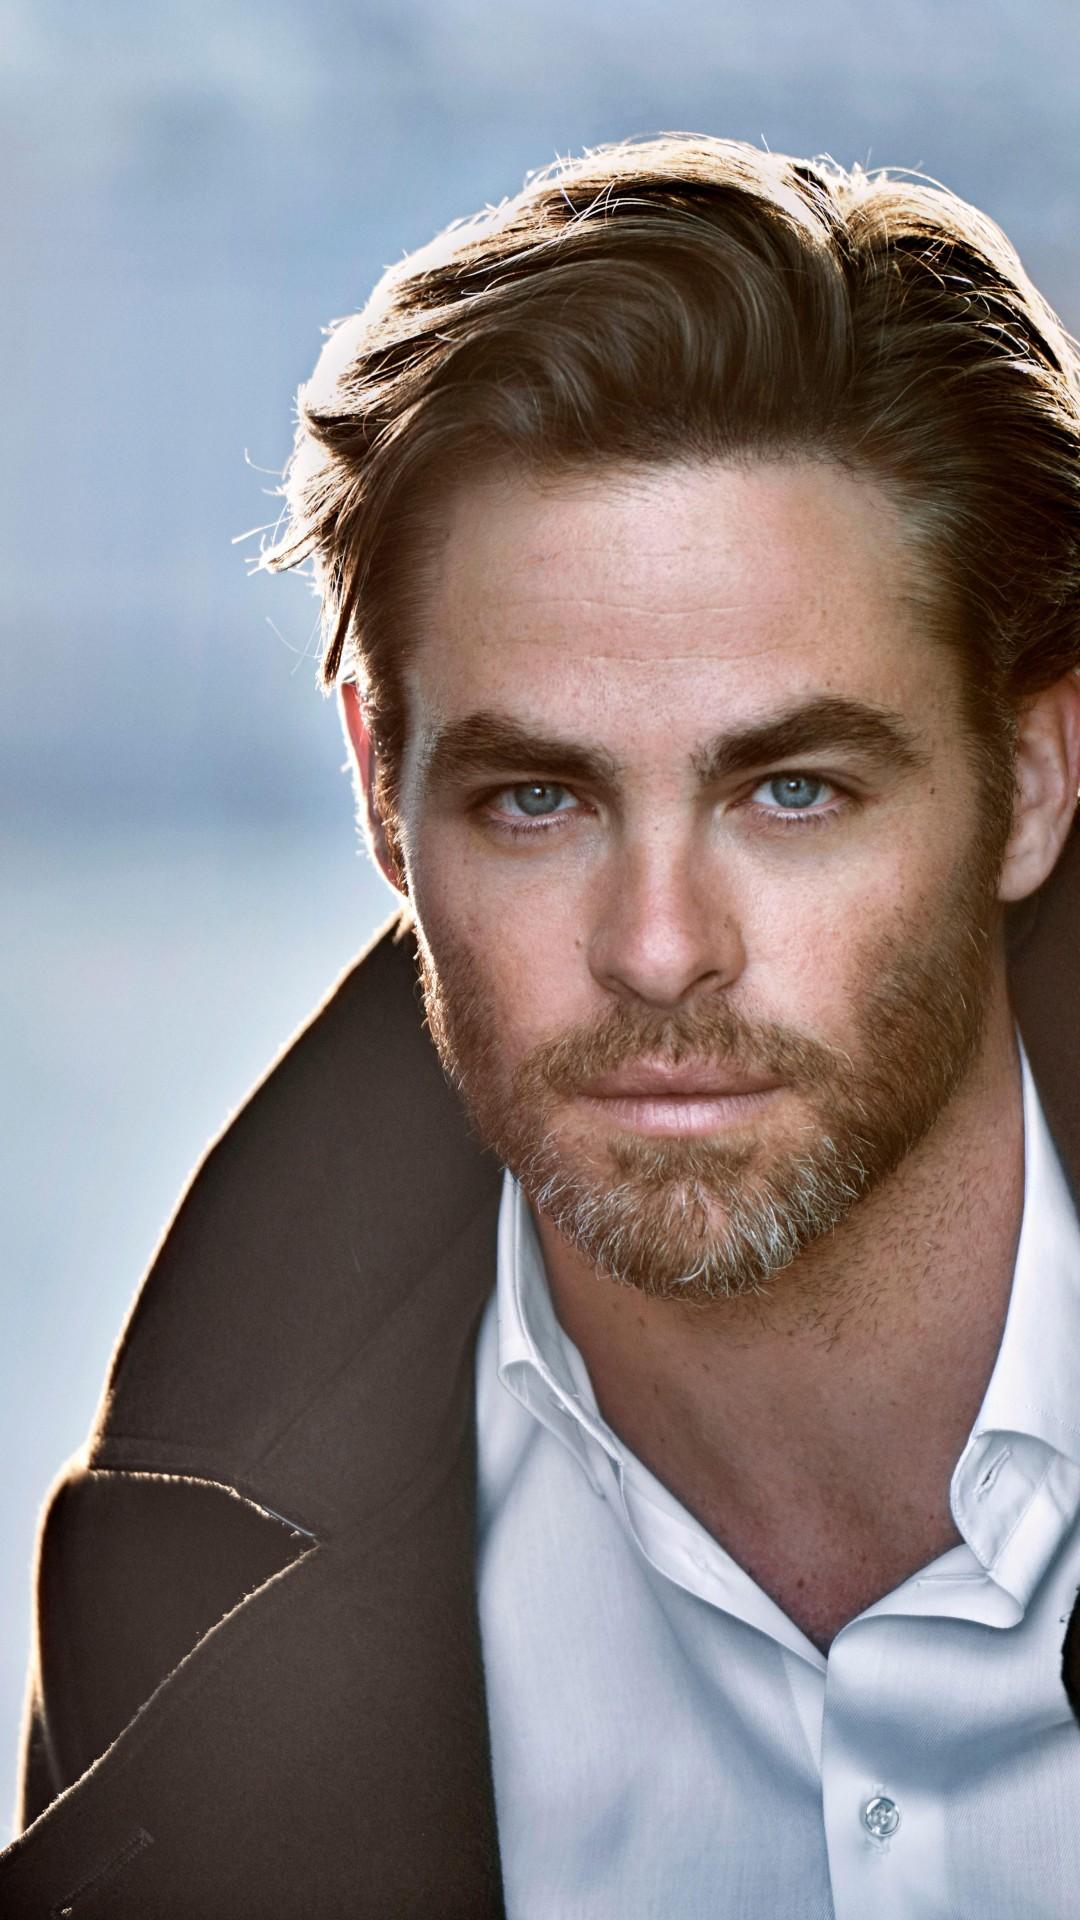 Best Male Actors Famous Male Actors Over 50: Wallpaper Marlon Teixeira, Top Fashion Male Models, Model